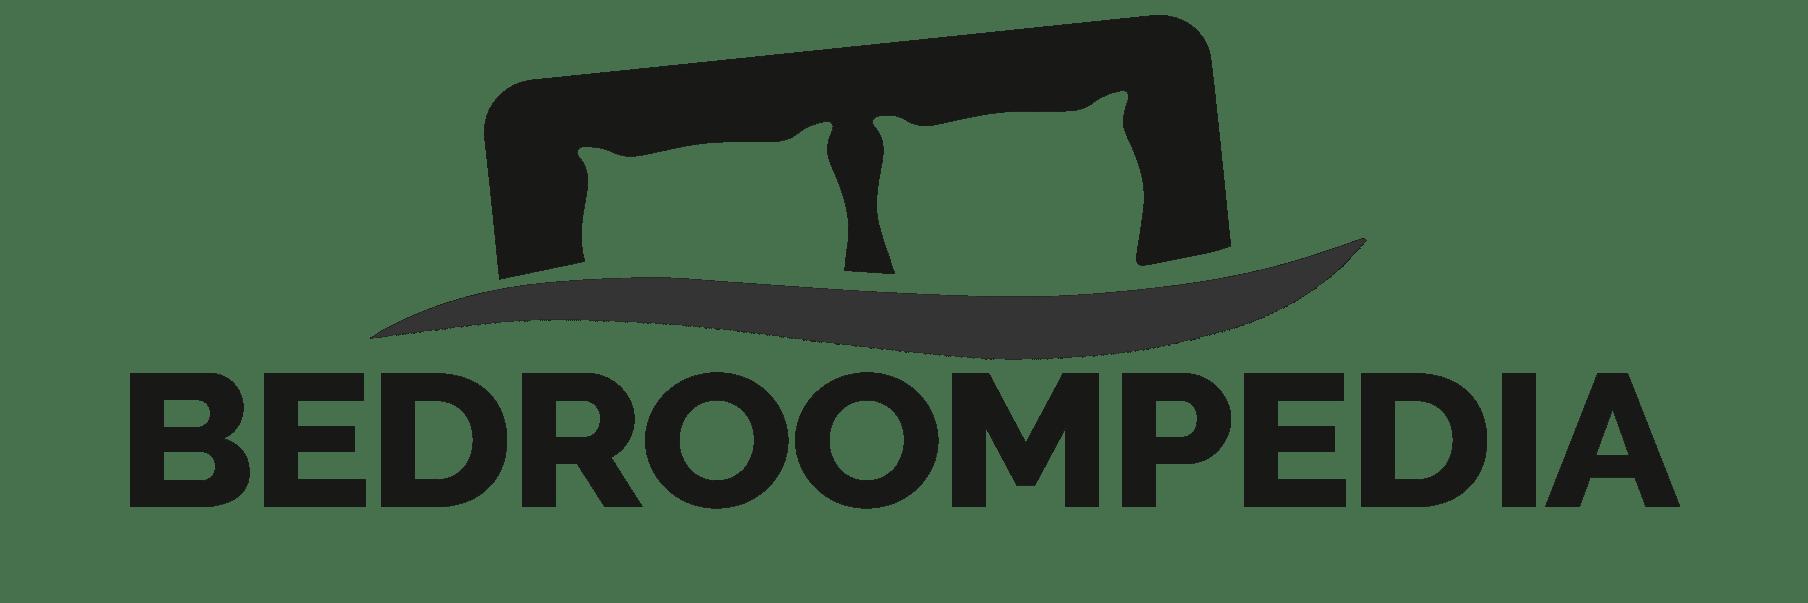 symbol mattress reviews our best buy